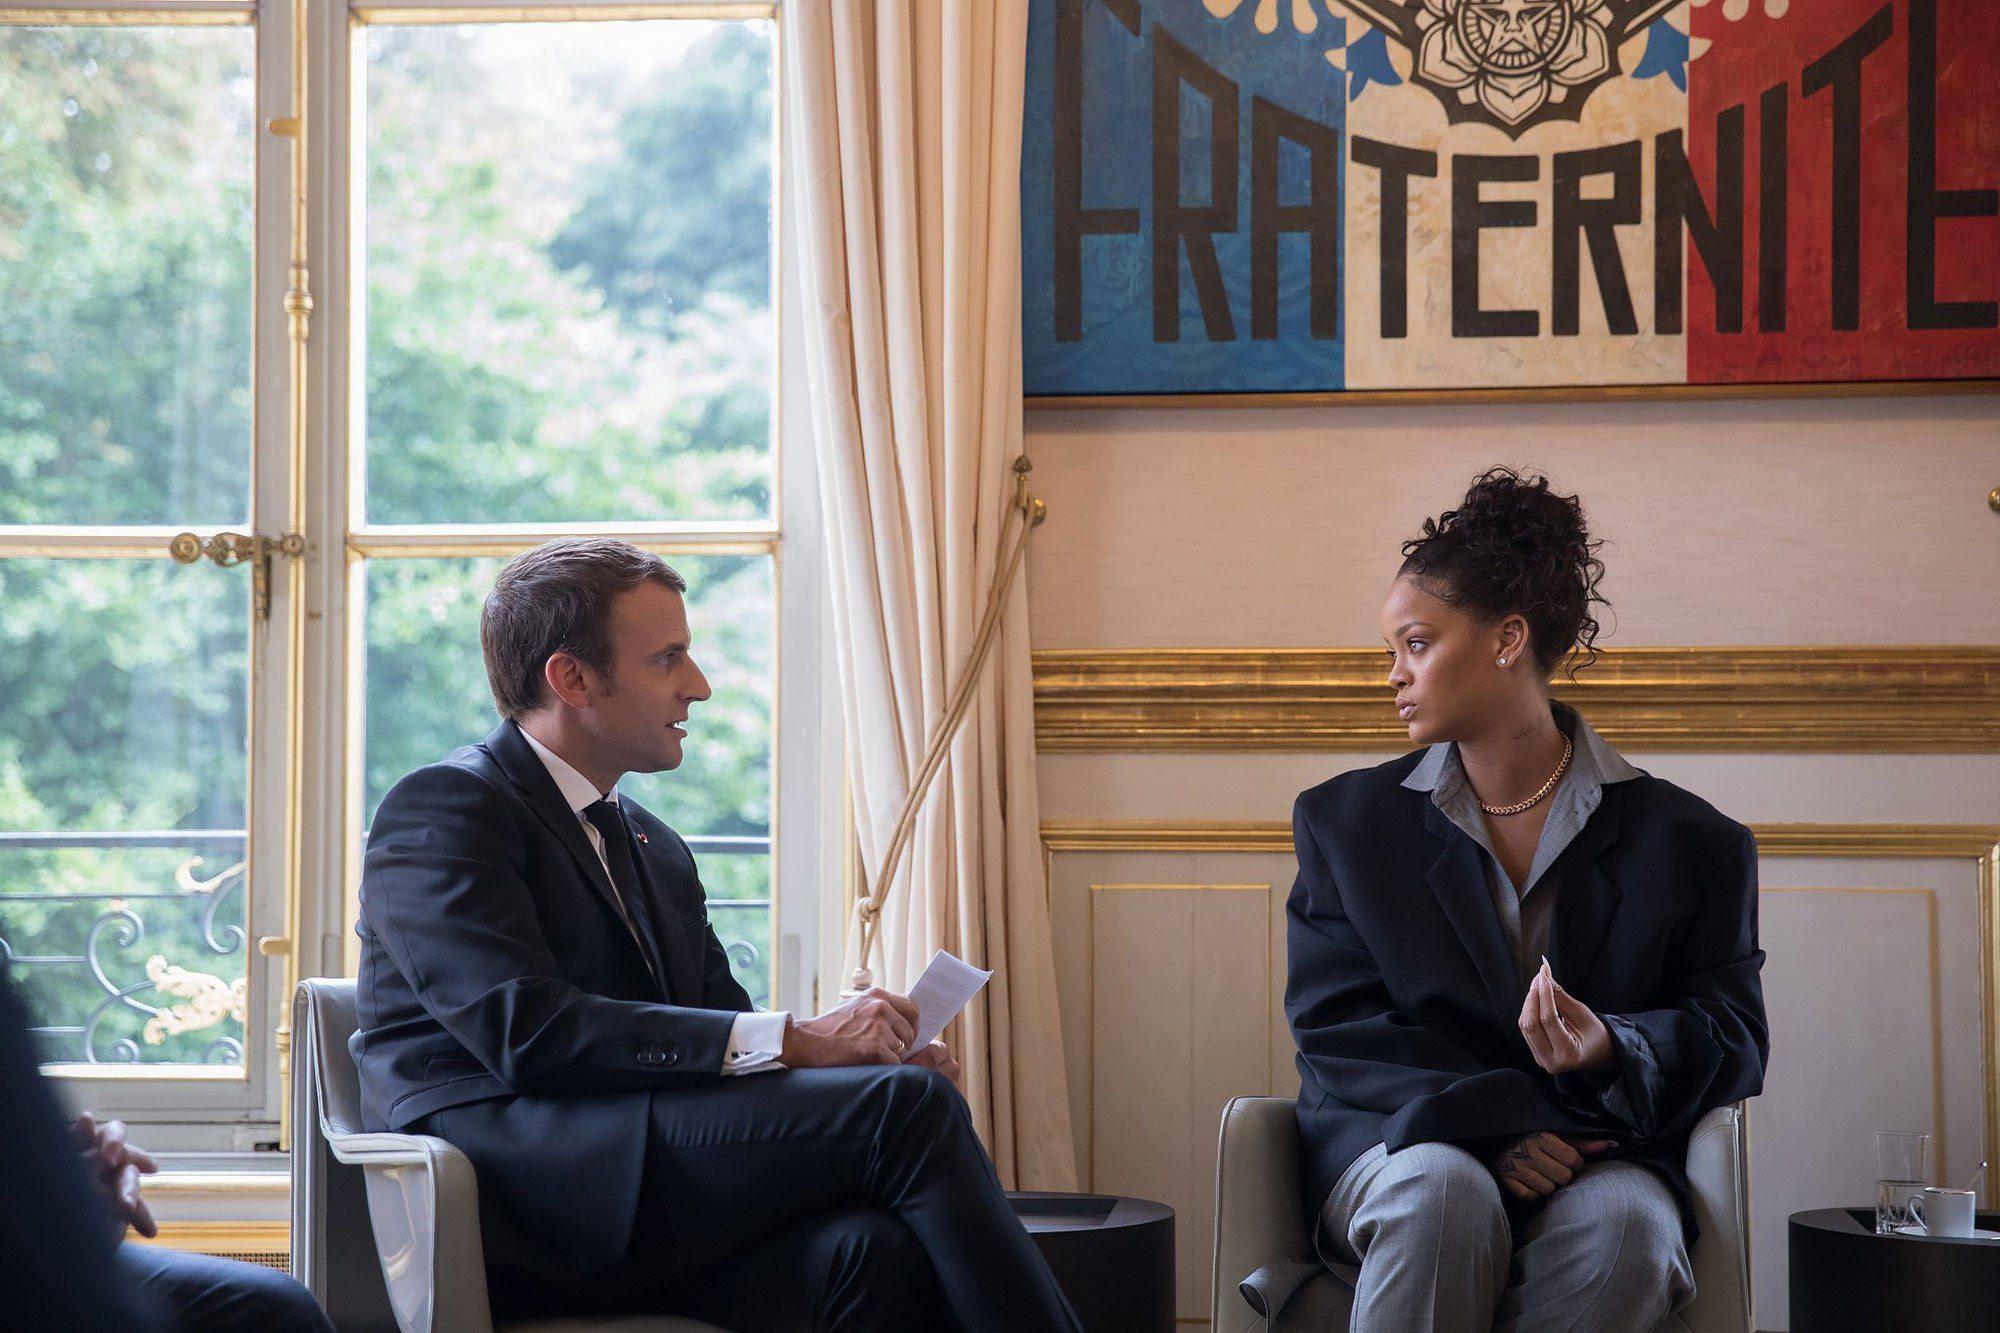 Rihanna and Emmanuel Macron https://twitter.com/EmmanuelMacron/status/890284967841992705 Source: Emmanuel Macron/Twitter